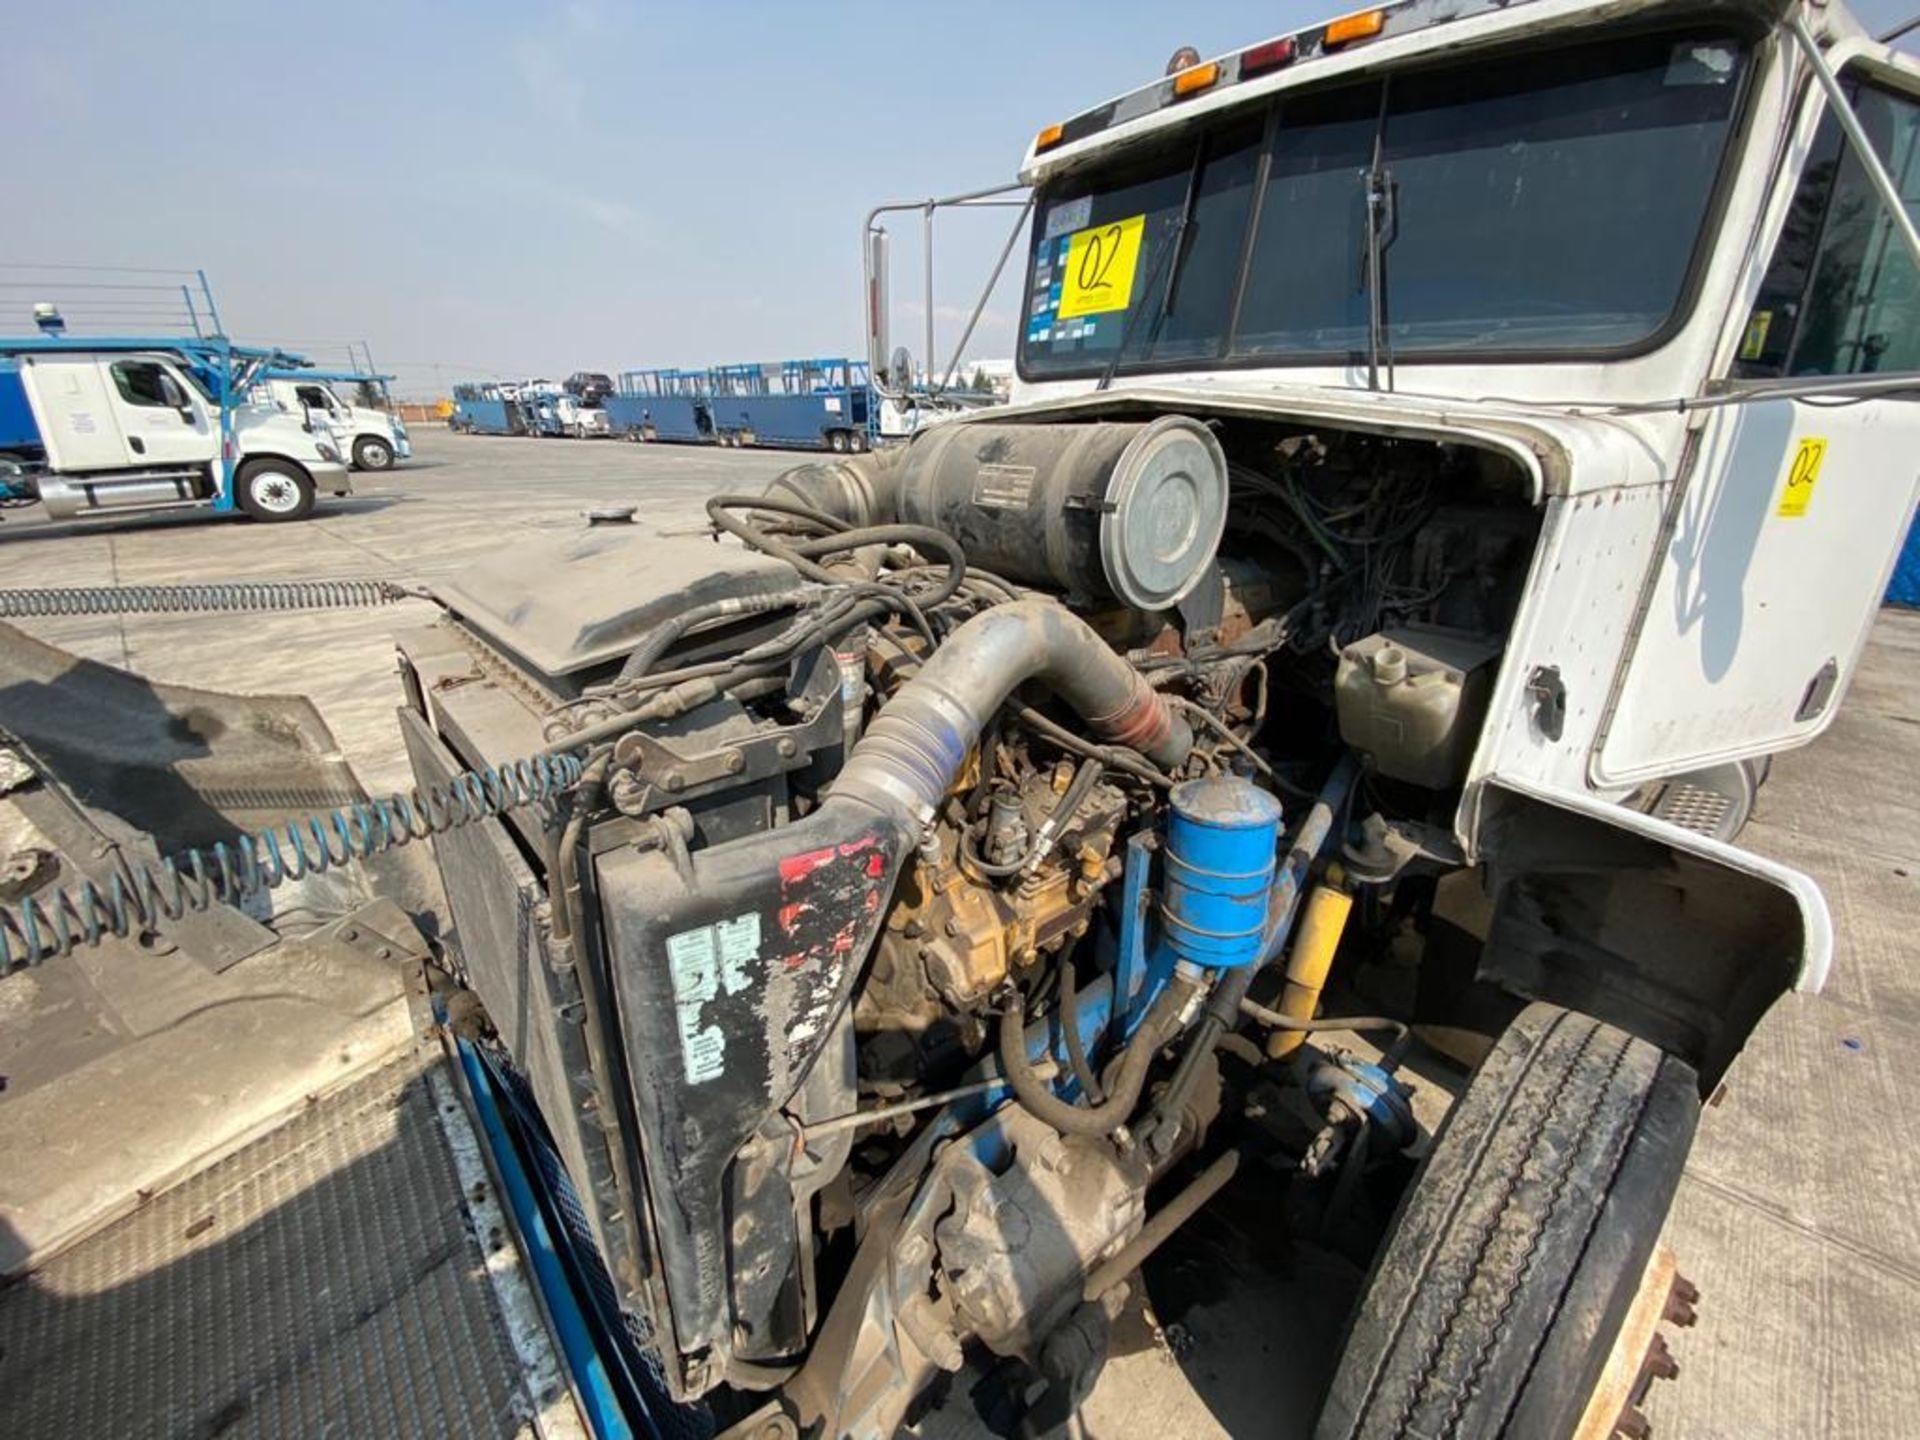 1999 Kenworth Sleeper truck tractor, standard transmission of 18 speeds - Image 67 of 75